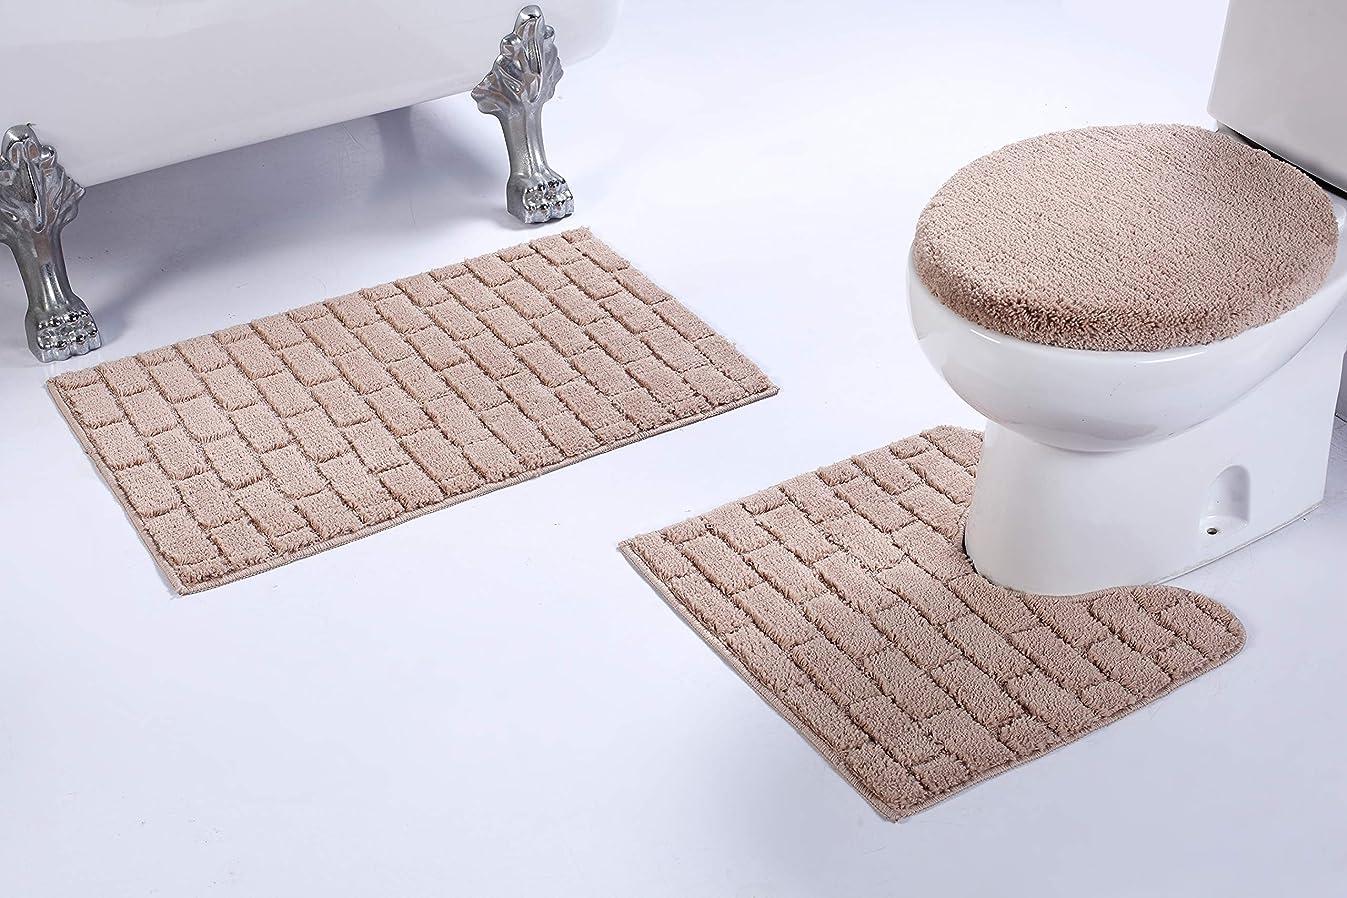 Fancy Linen 3pc Non-Slip Bath Mat Set with Brick Pattern Solid Beige Bathroom U-Shaped Contour Rug, Mat and Toilet Lid Cover New # Bath 67